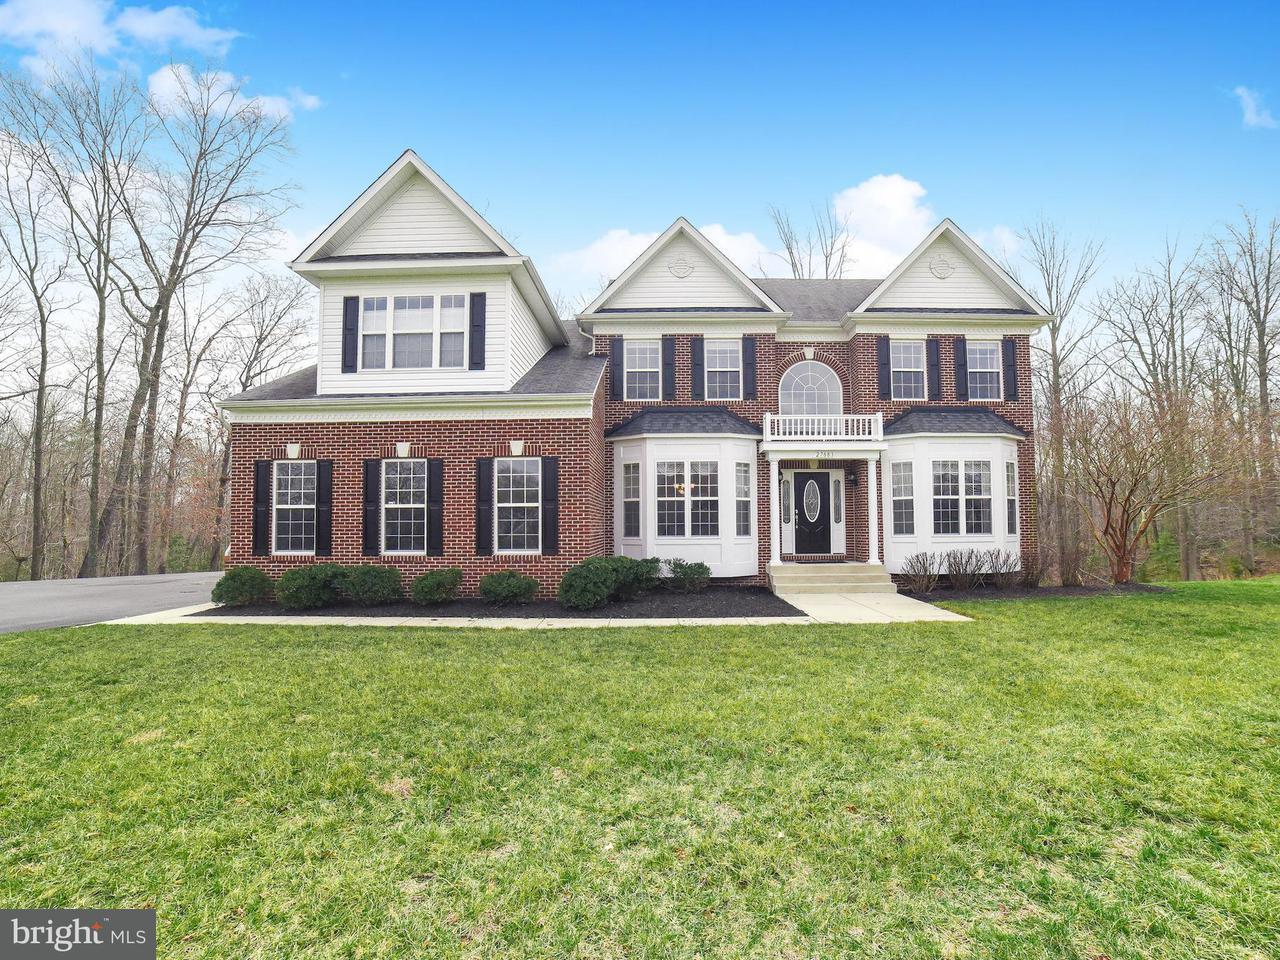 Single Family Home for Sale at 27883 Ben Oaks Drive 27883 Ben Oaks Drive Mechanicsville, Maryland 20659 United States